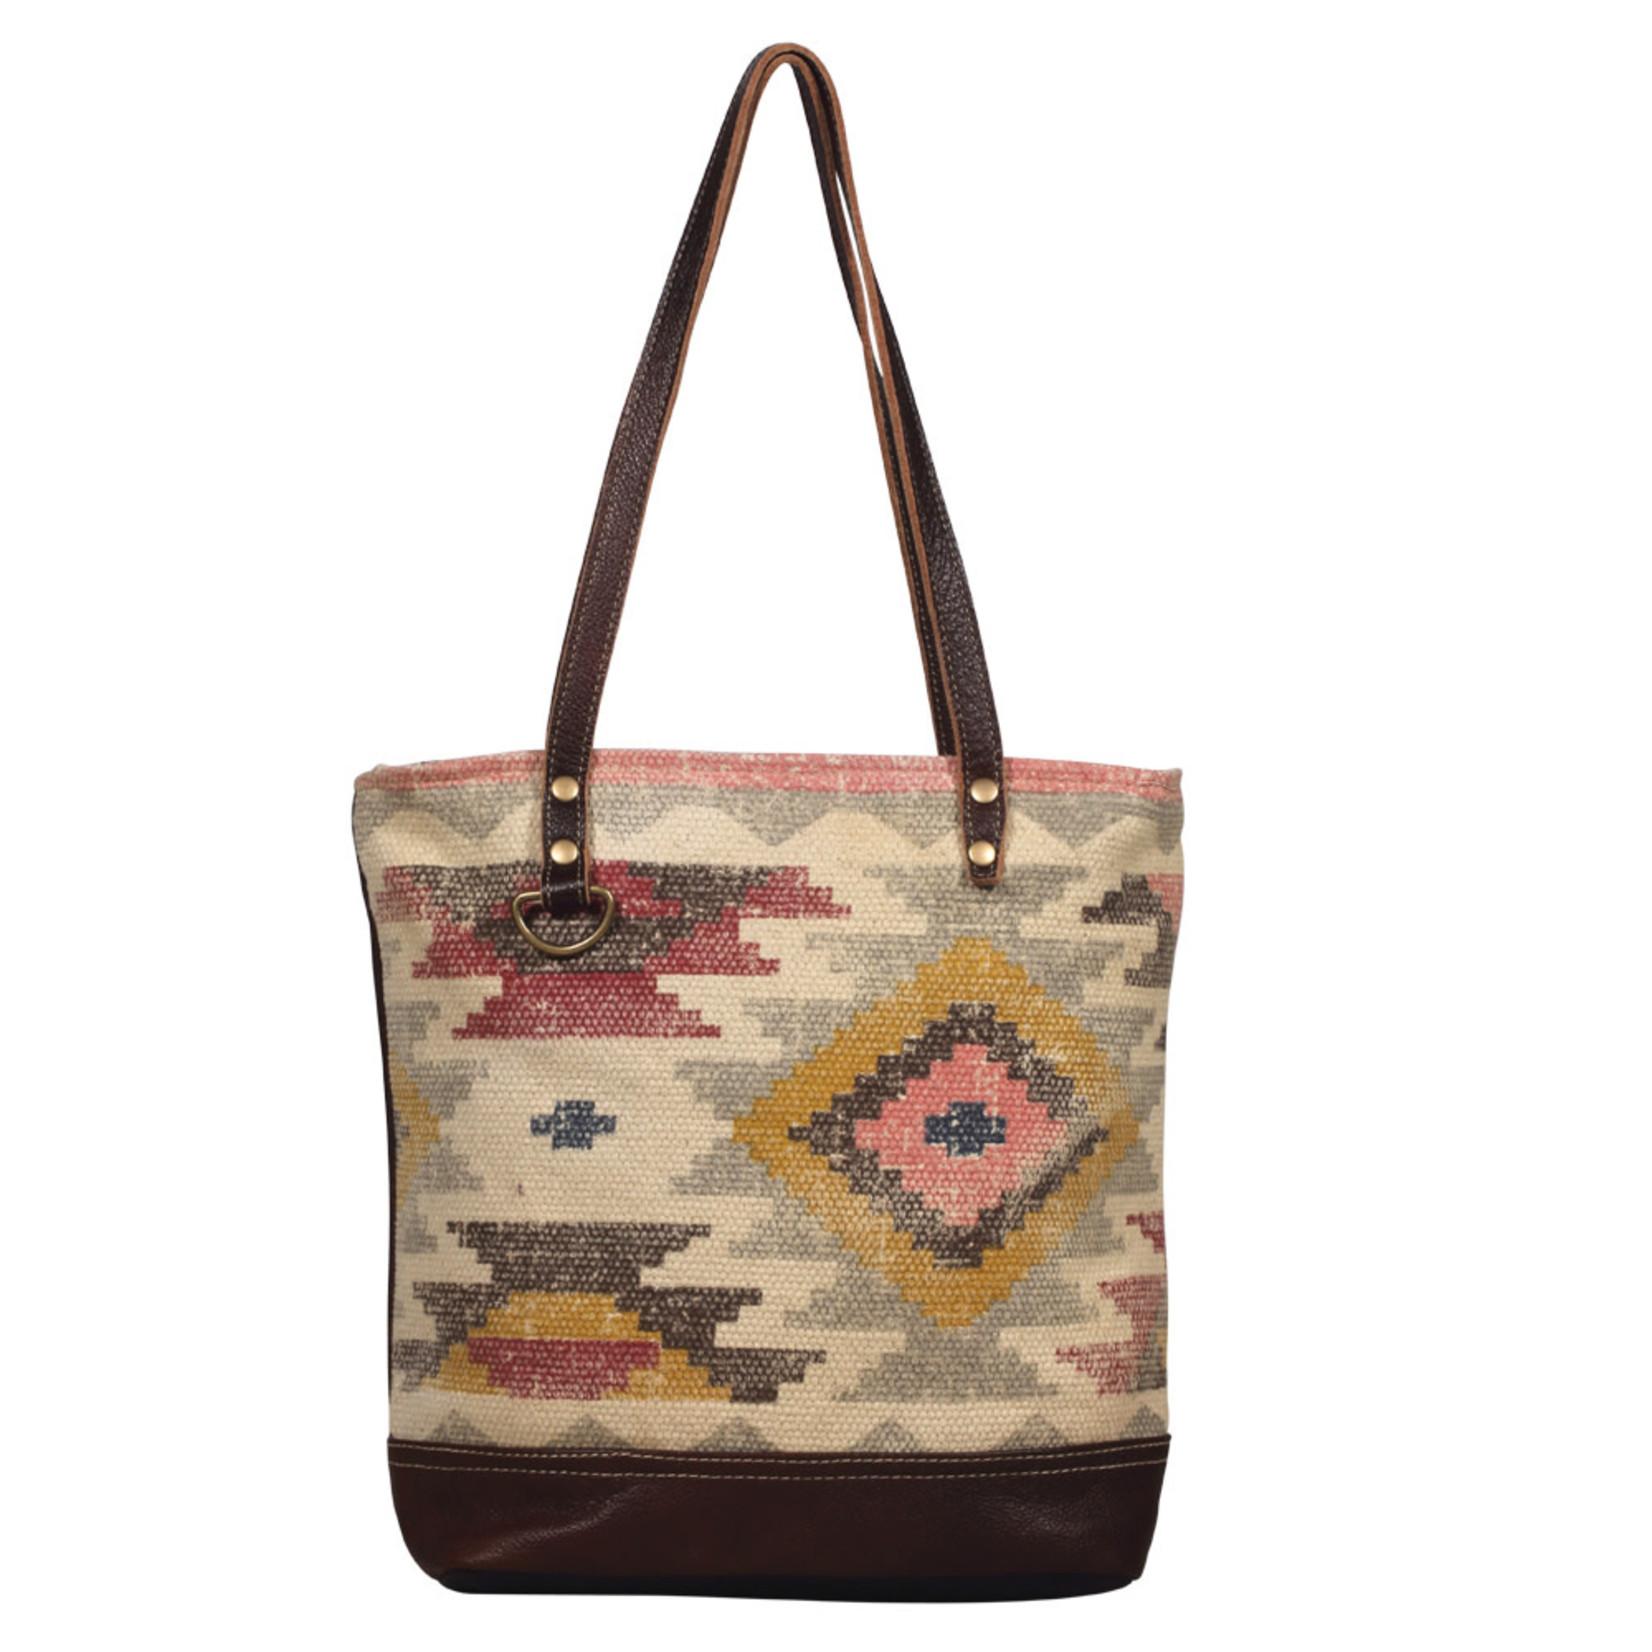 Myra Bags S-2043 Exemplar Tote Bag